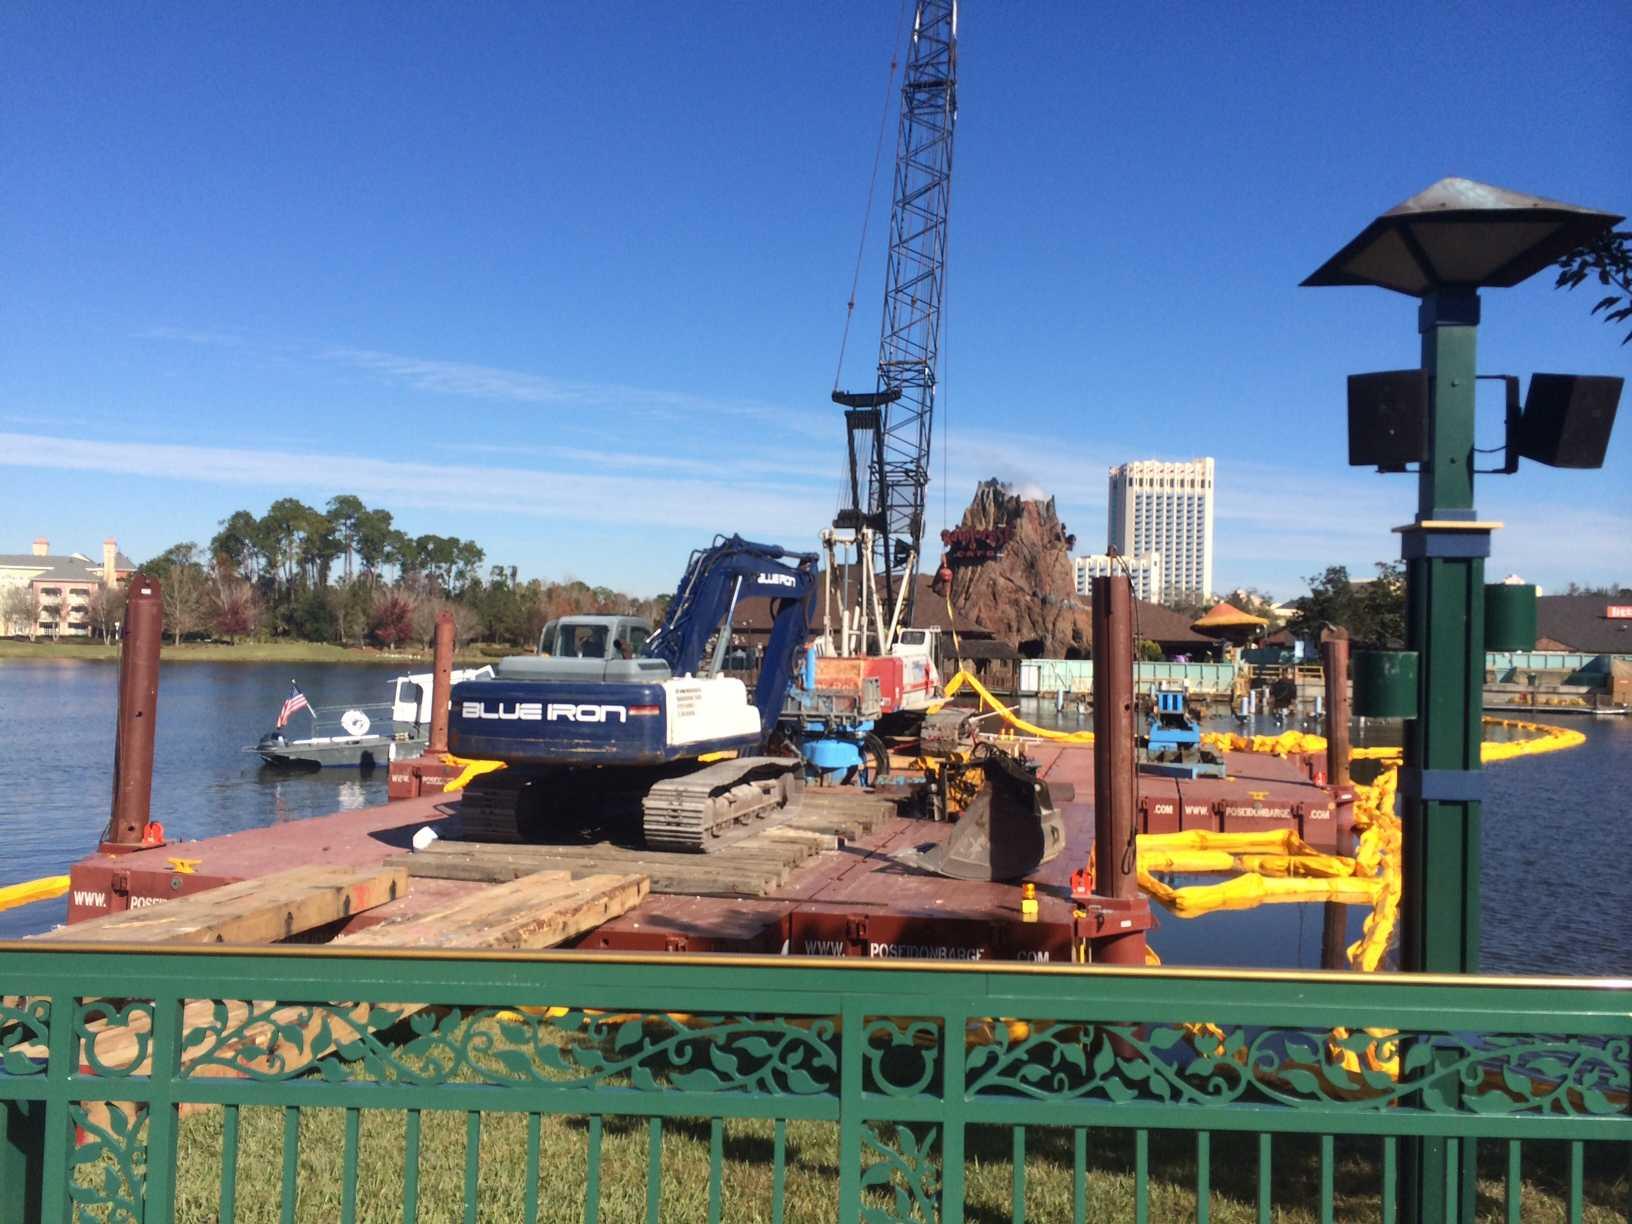 Marketplace Causeway construction cranes